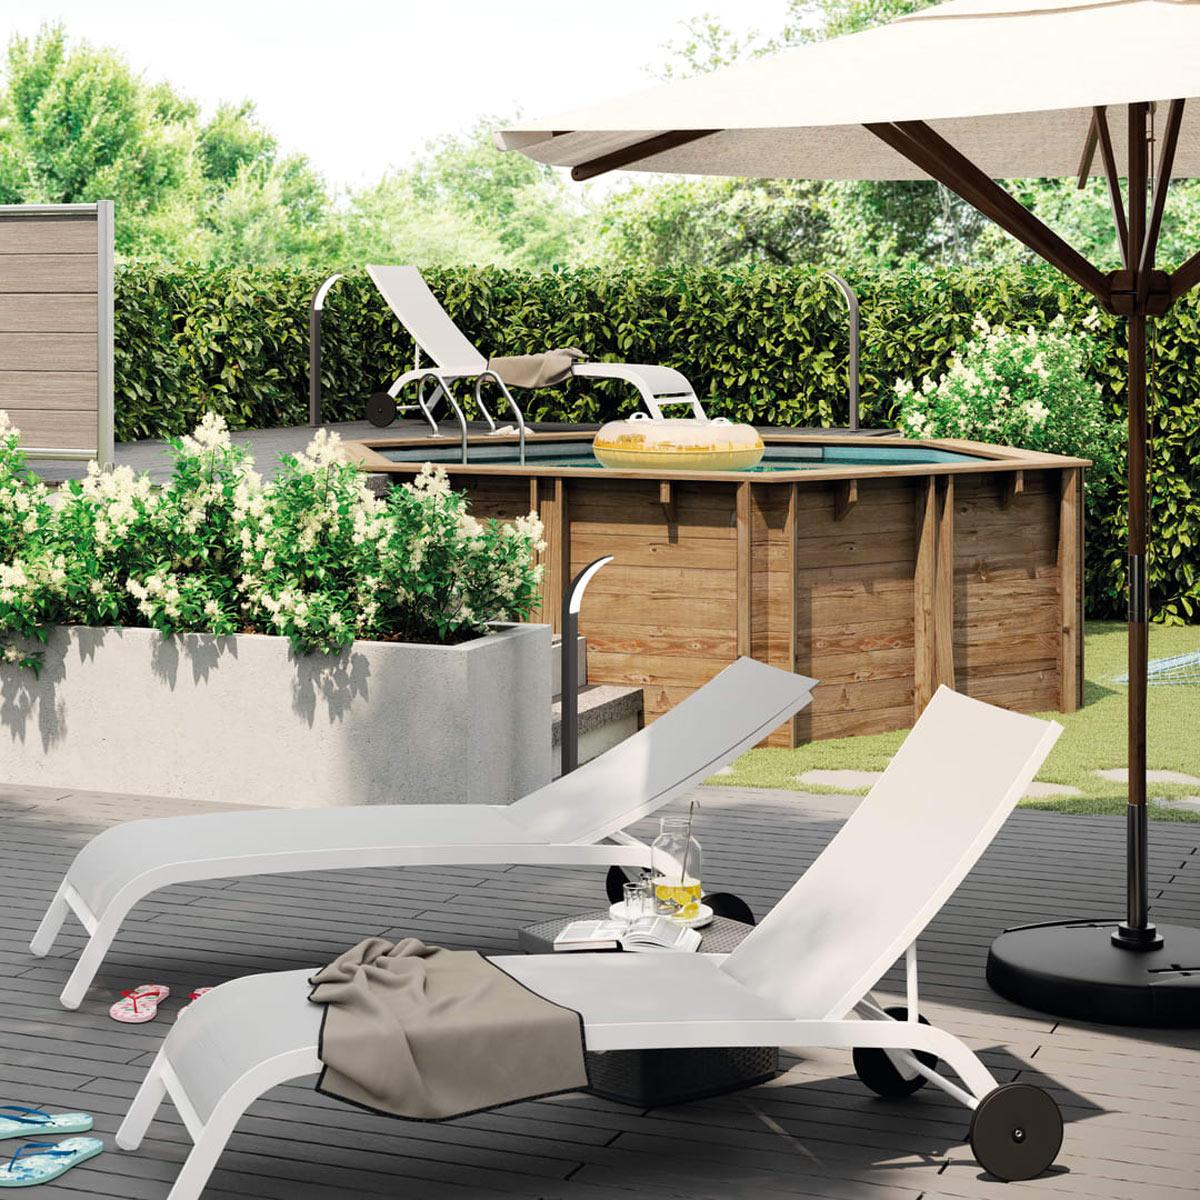 Leroy Merlin: arredo giardino 2020! 15 idee per un ...